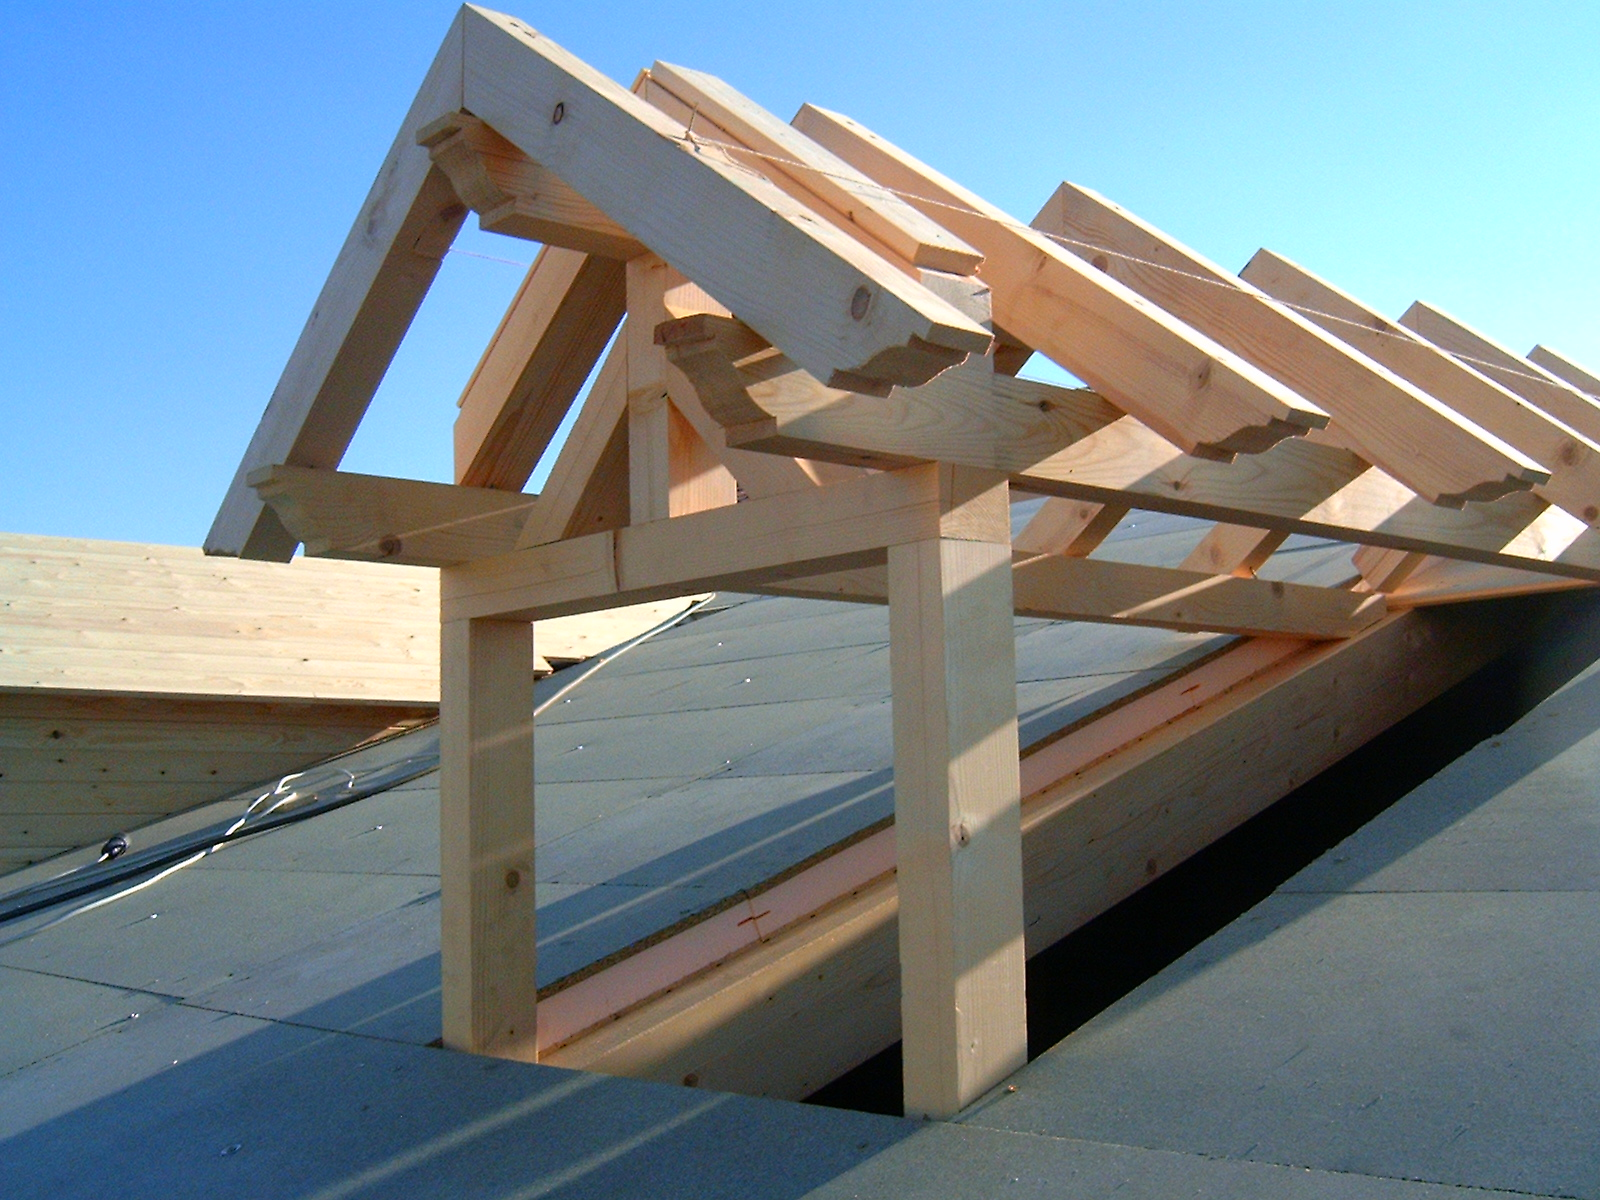 Carpinteria de madera luis aliste for Tejados de madera antiguos